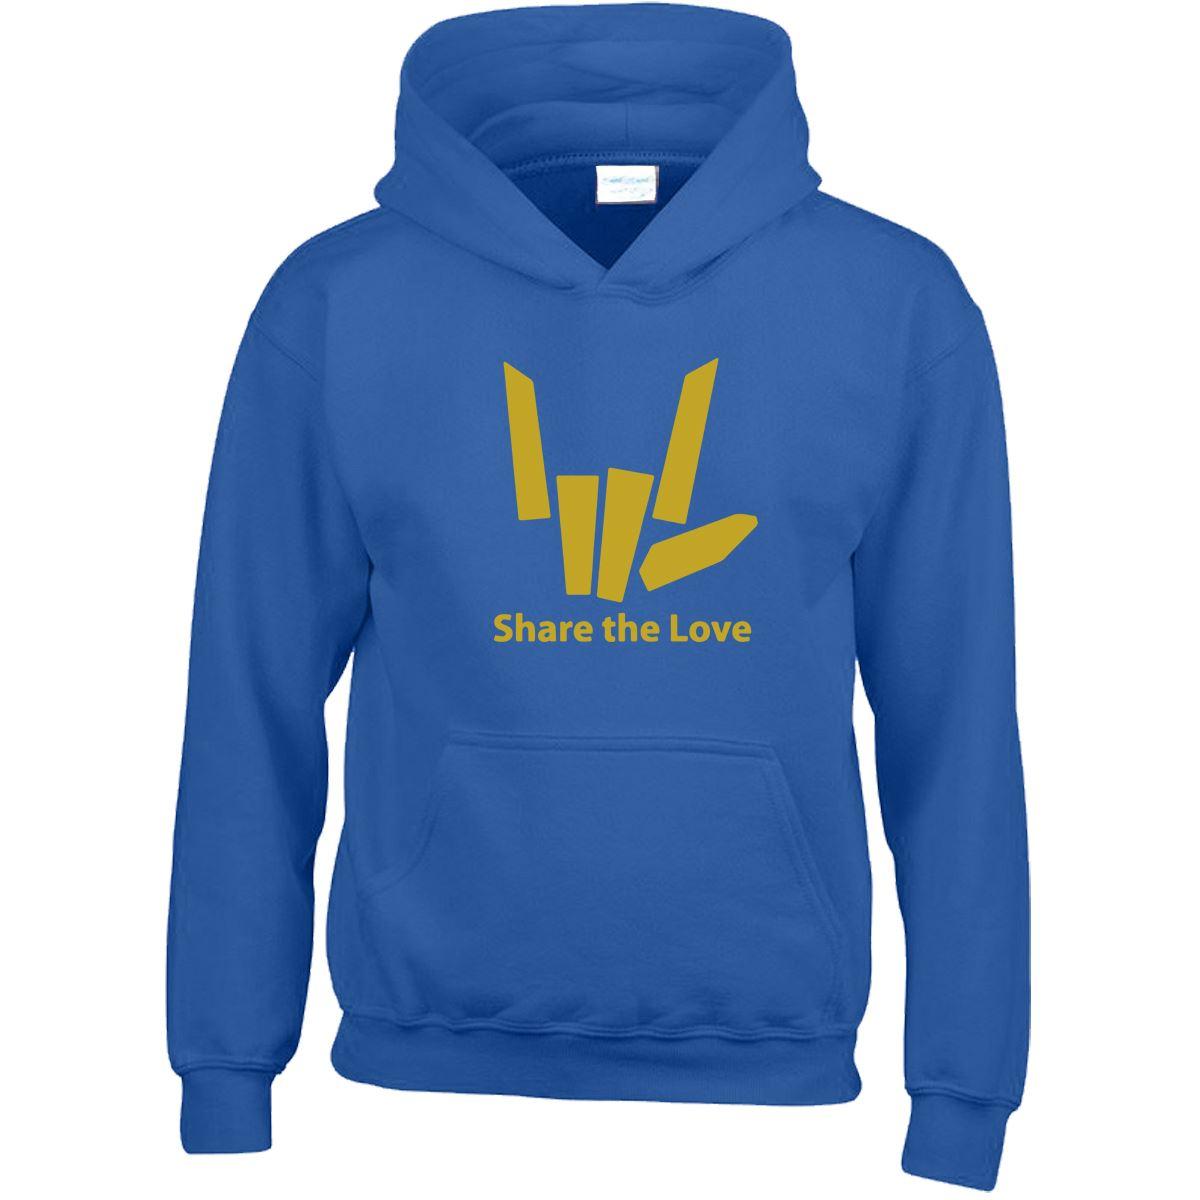 Share The Love Car kids hoodie Kids Sharerghini hoodie share The Love Kids hoodie Share The Love shirt Sharerghini sweater gift for son